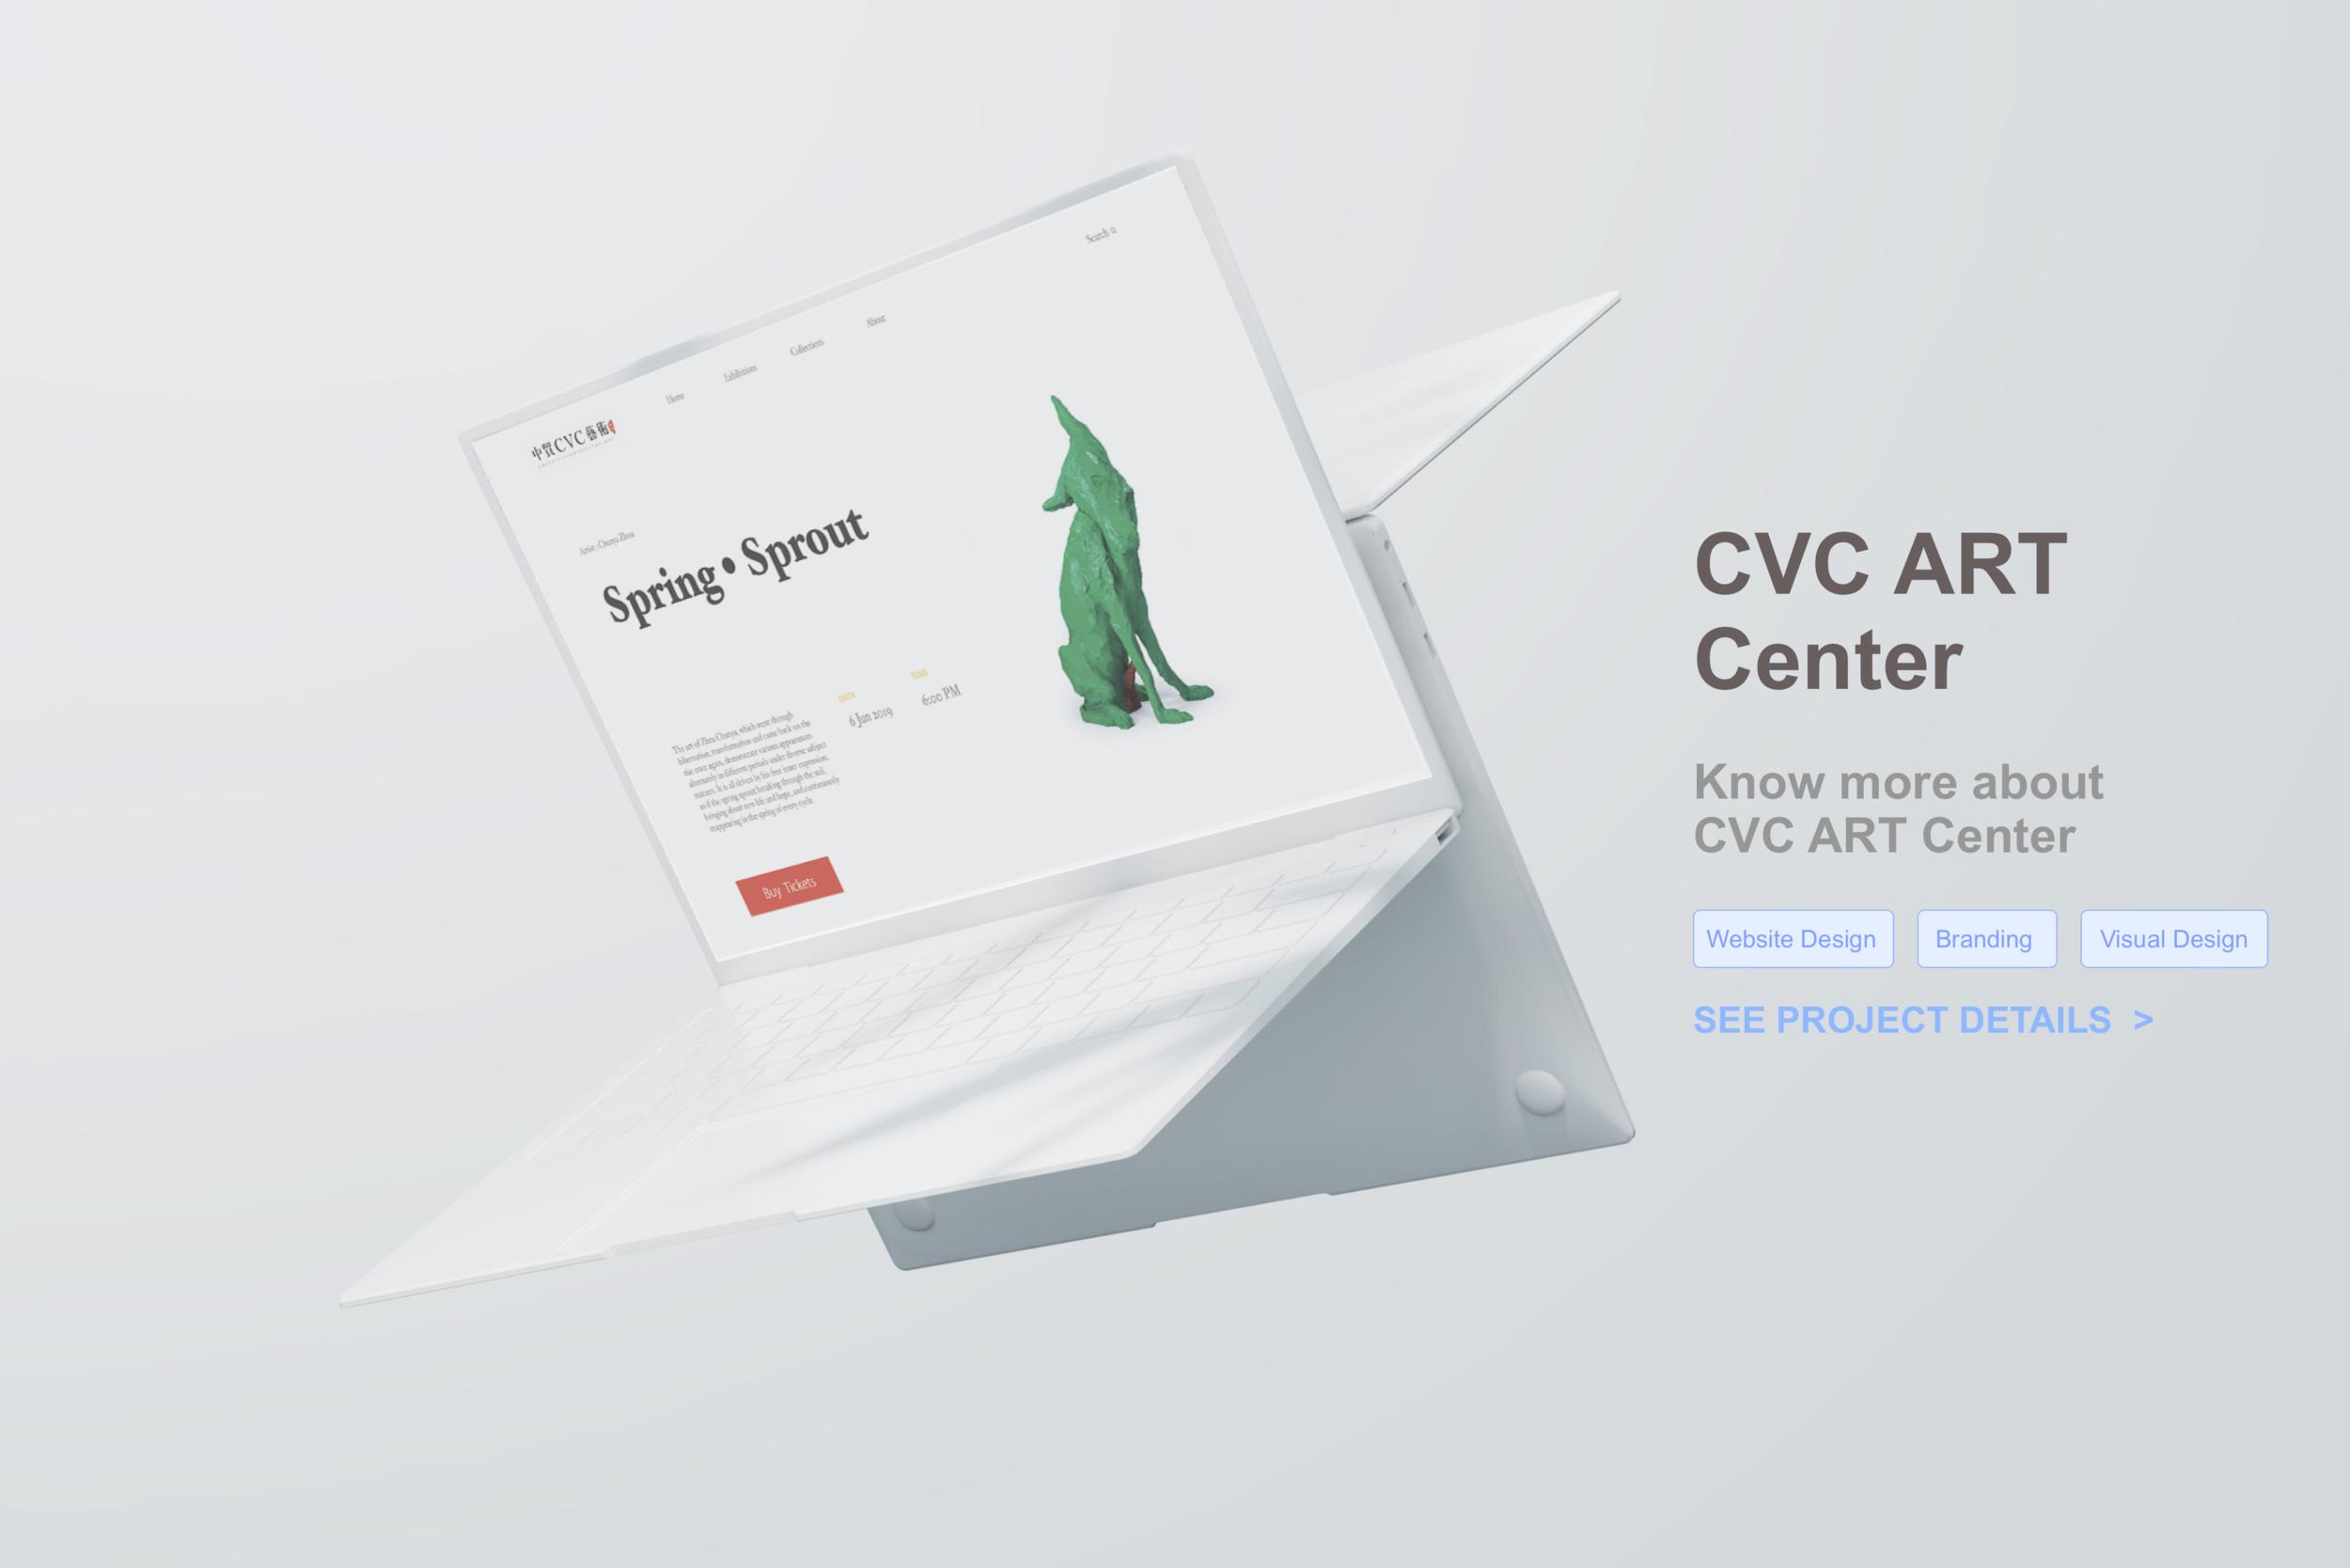 cvc-1.png